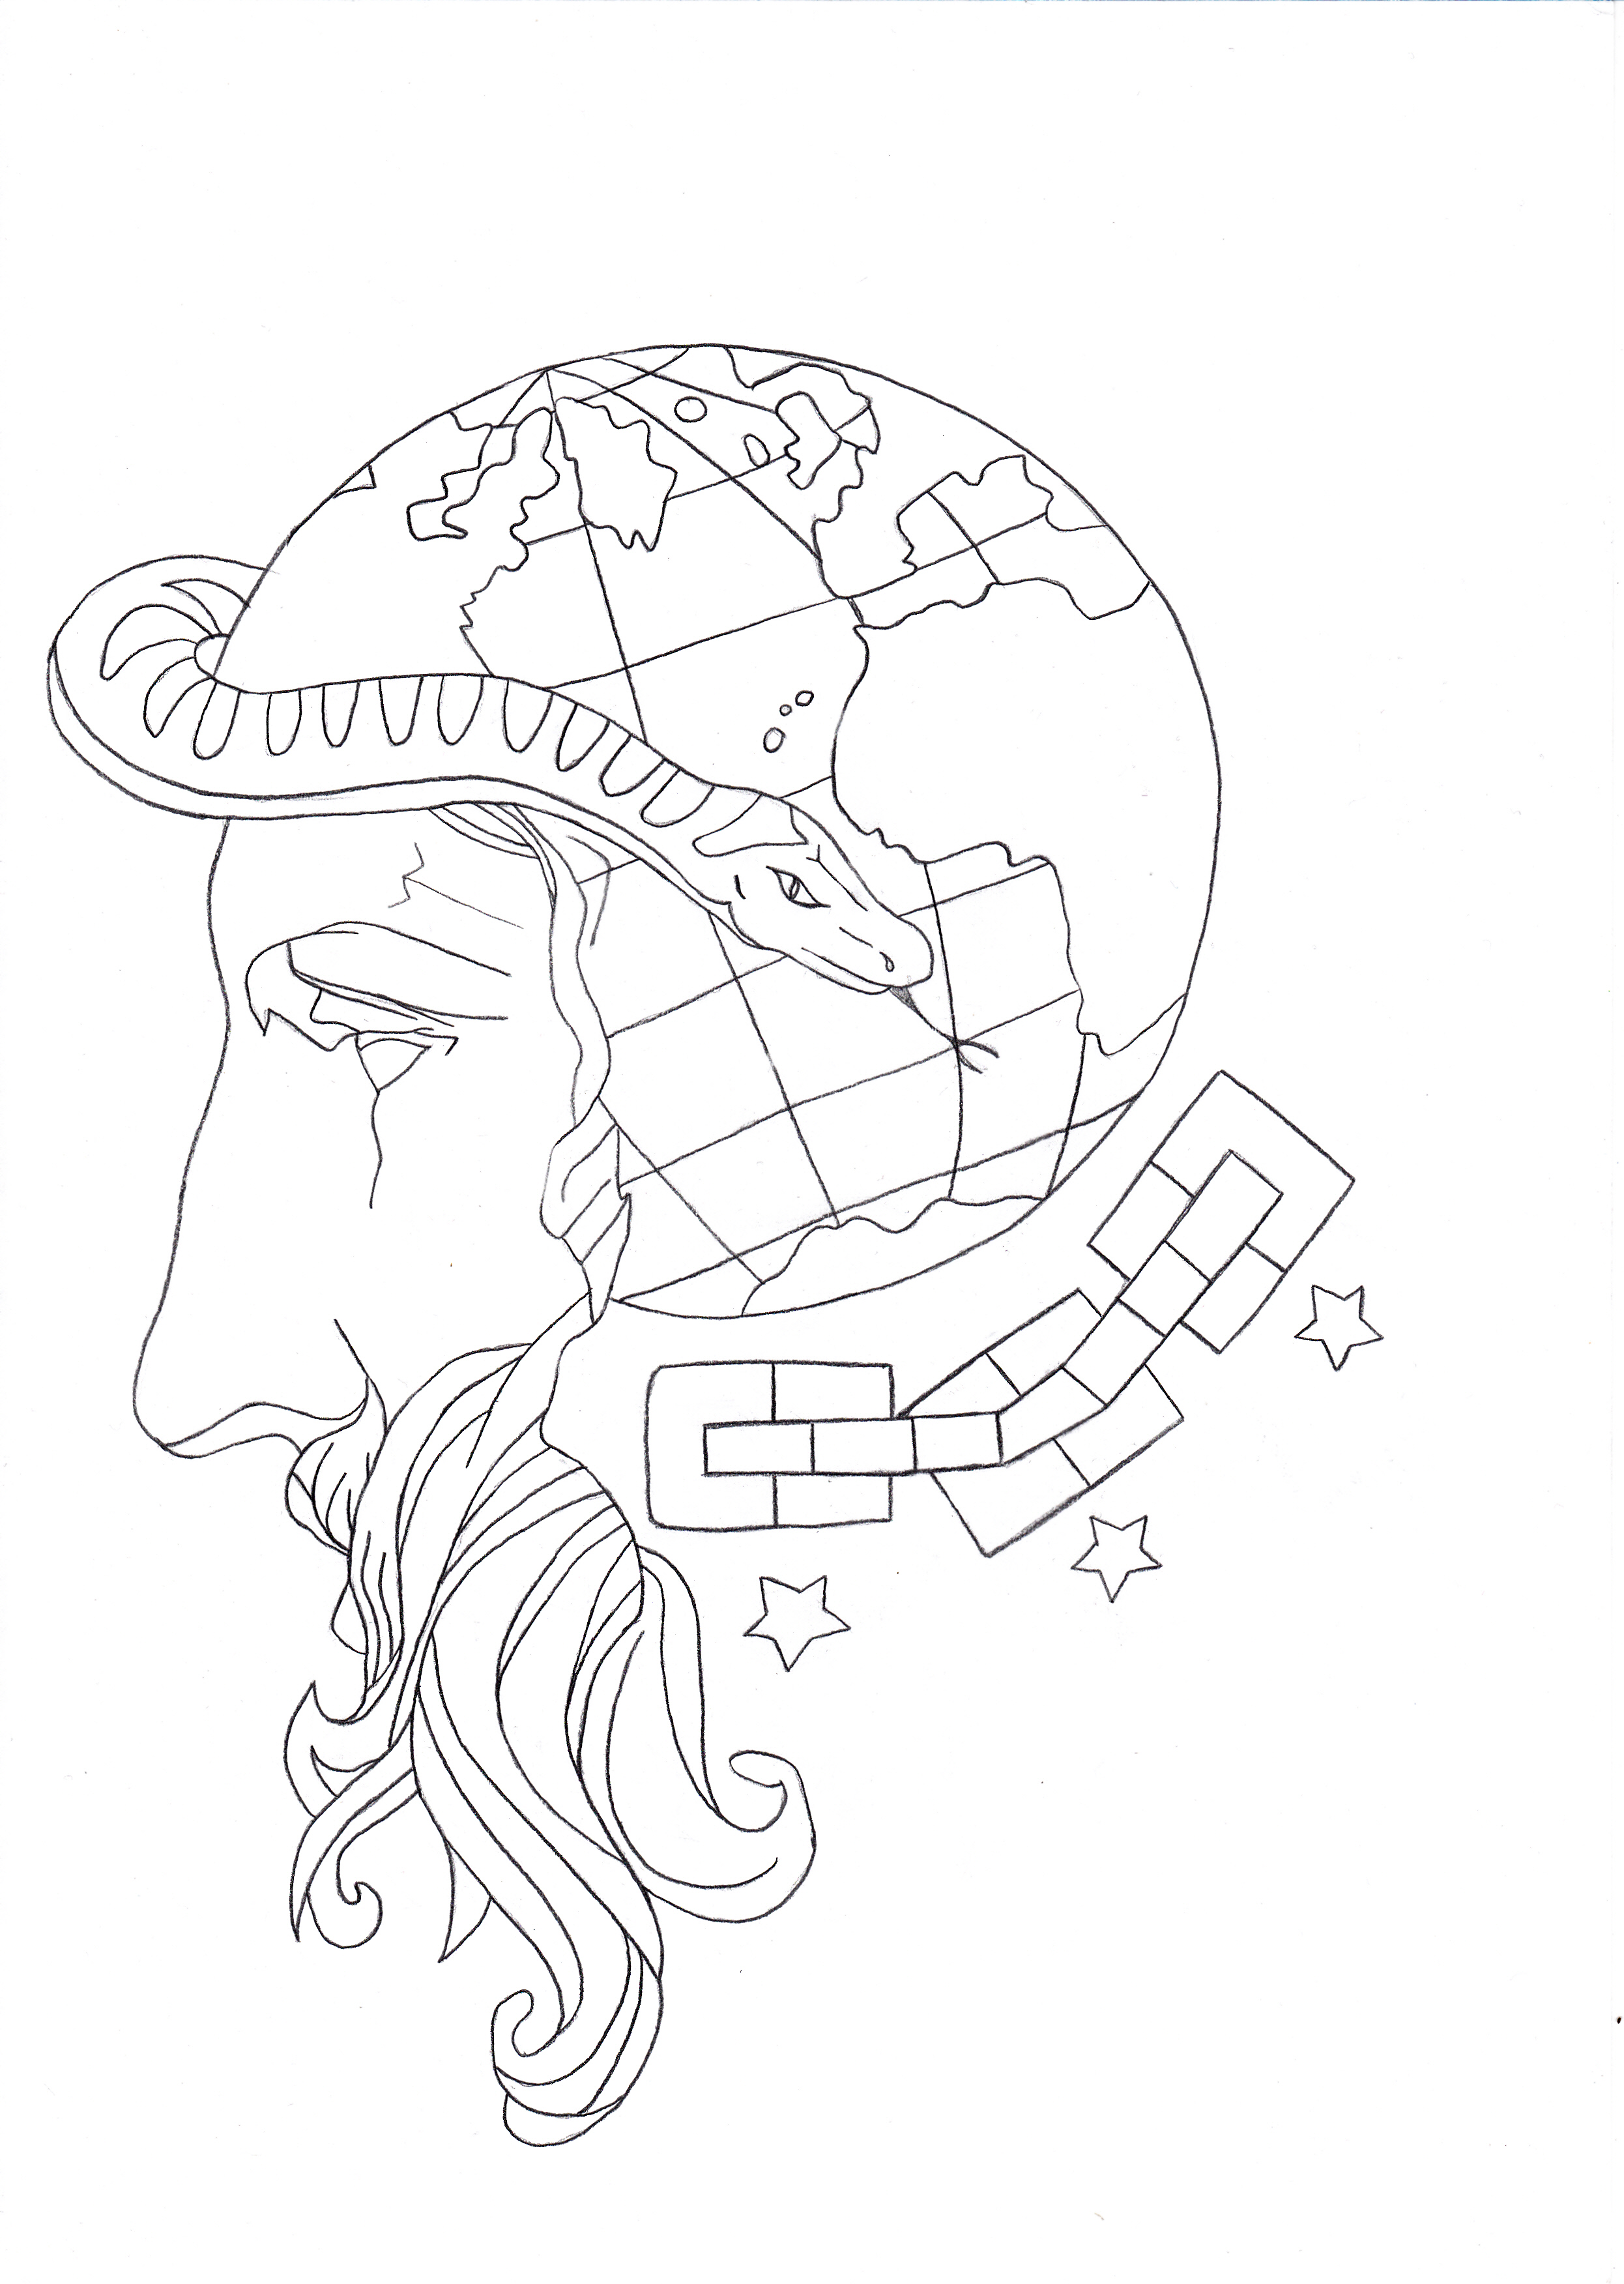 Hephaestus Anvil Tattoo Designs